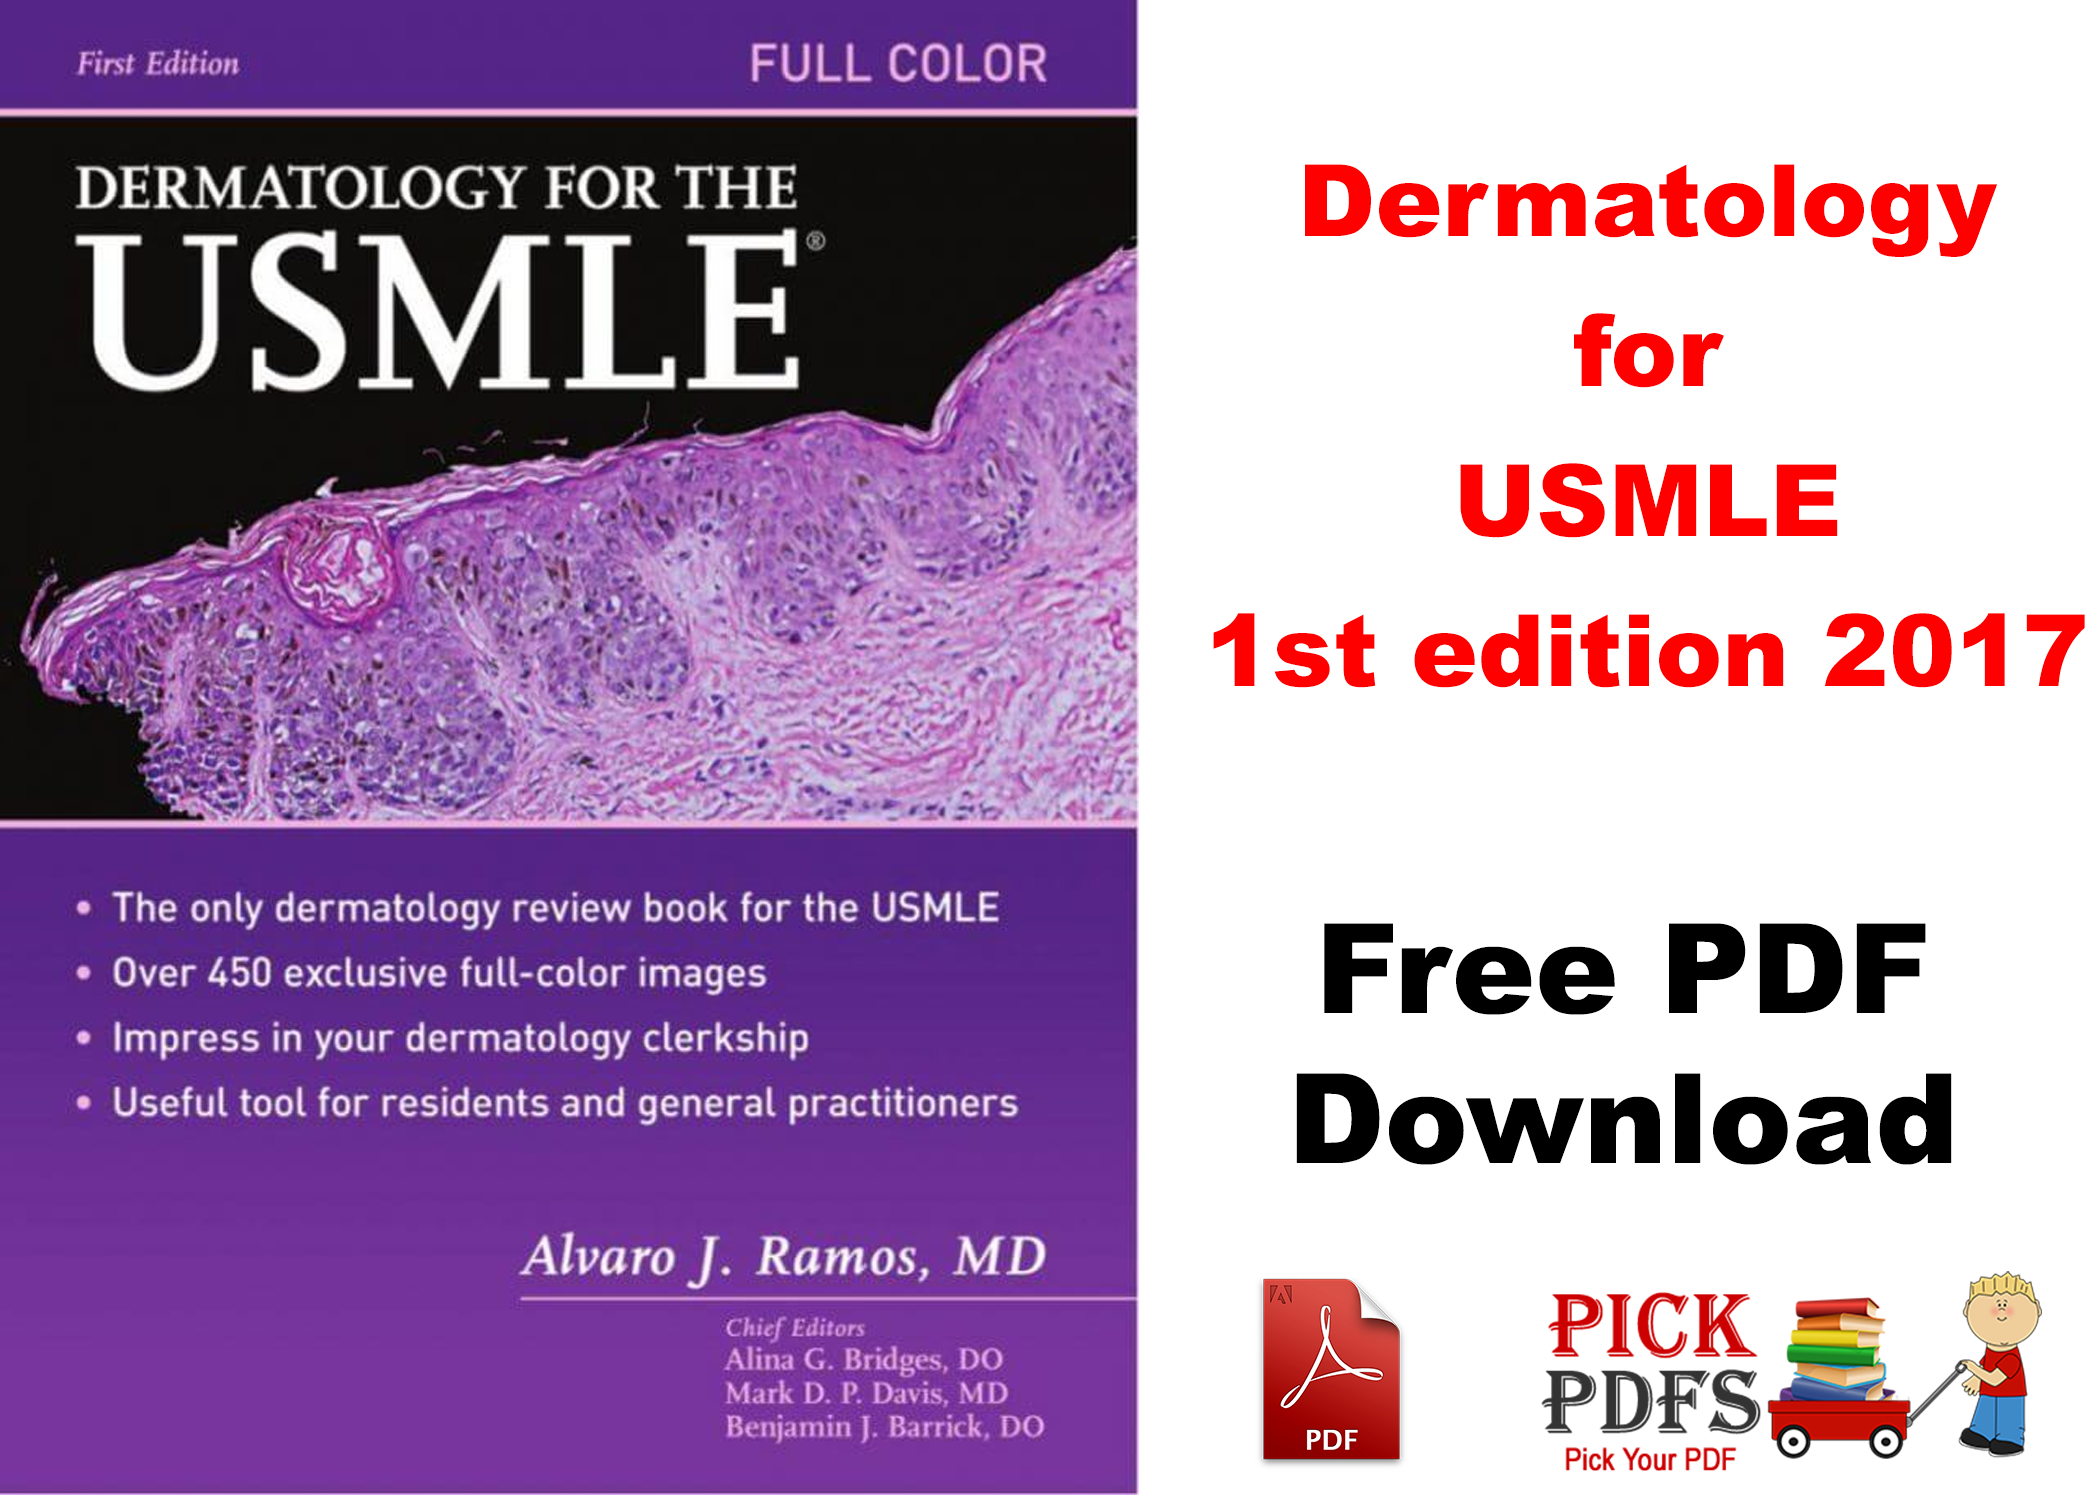 https://pickpdfs.com/dermatology-for-usmle-1st-edition-2017-free-book-download-pdf/